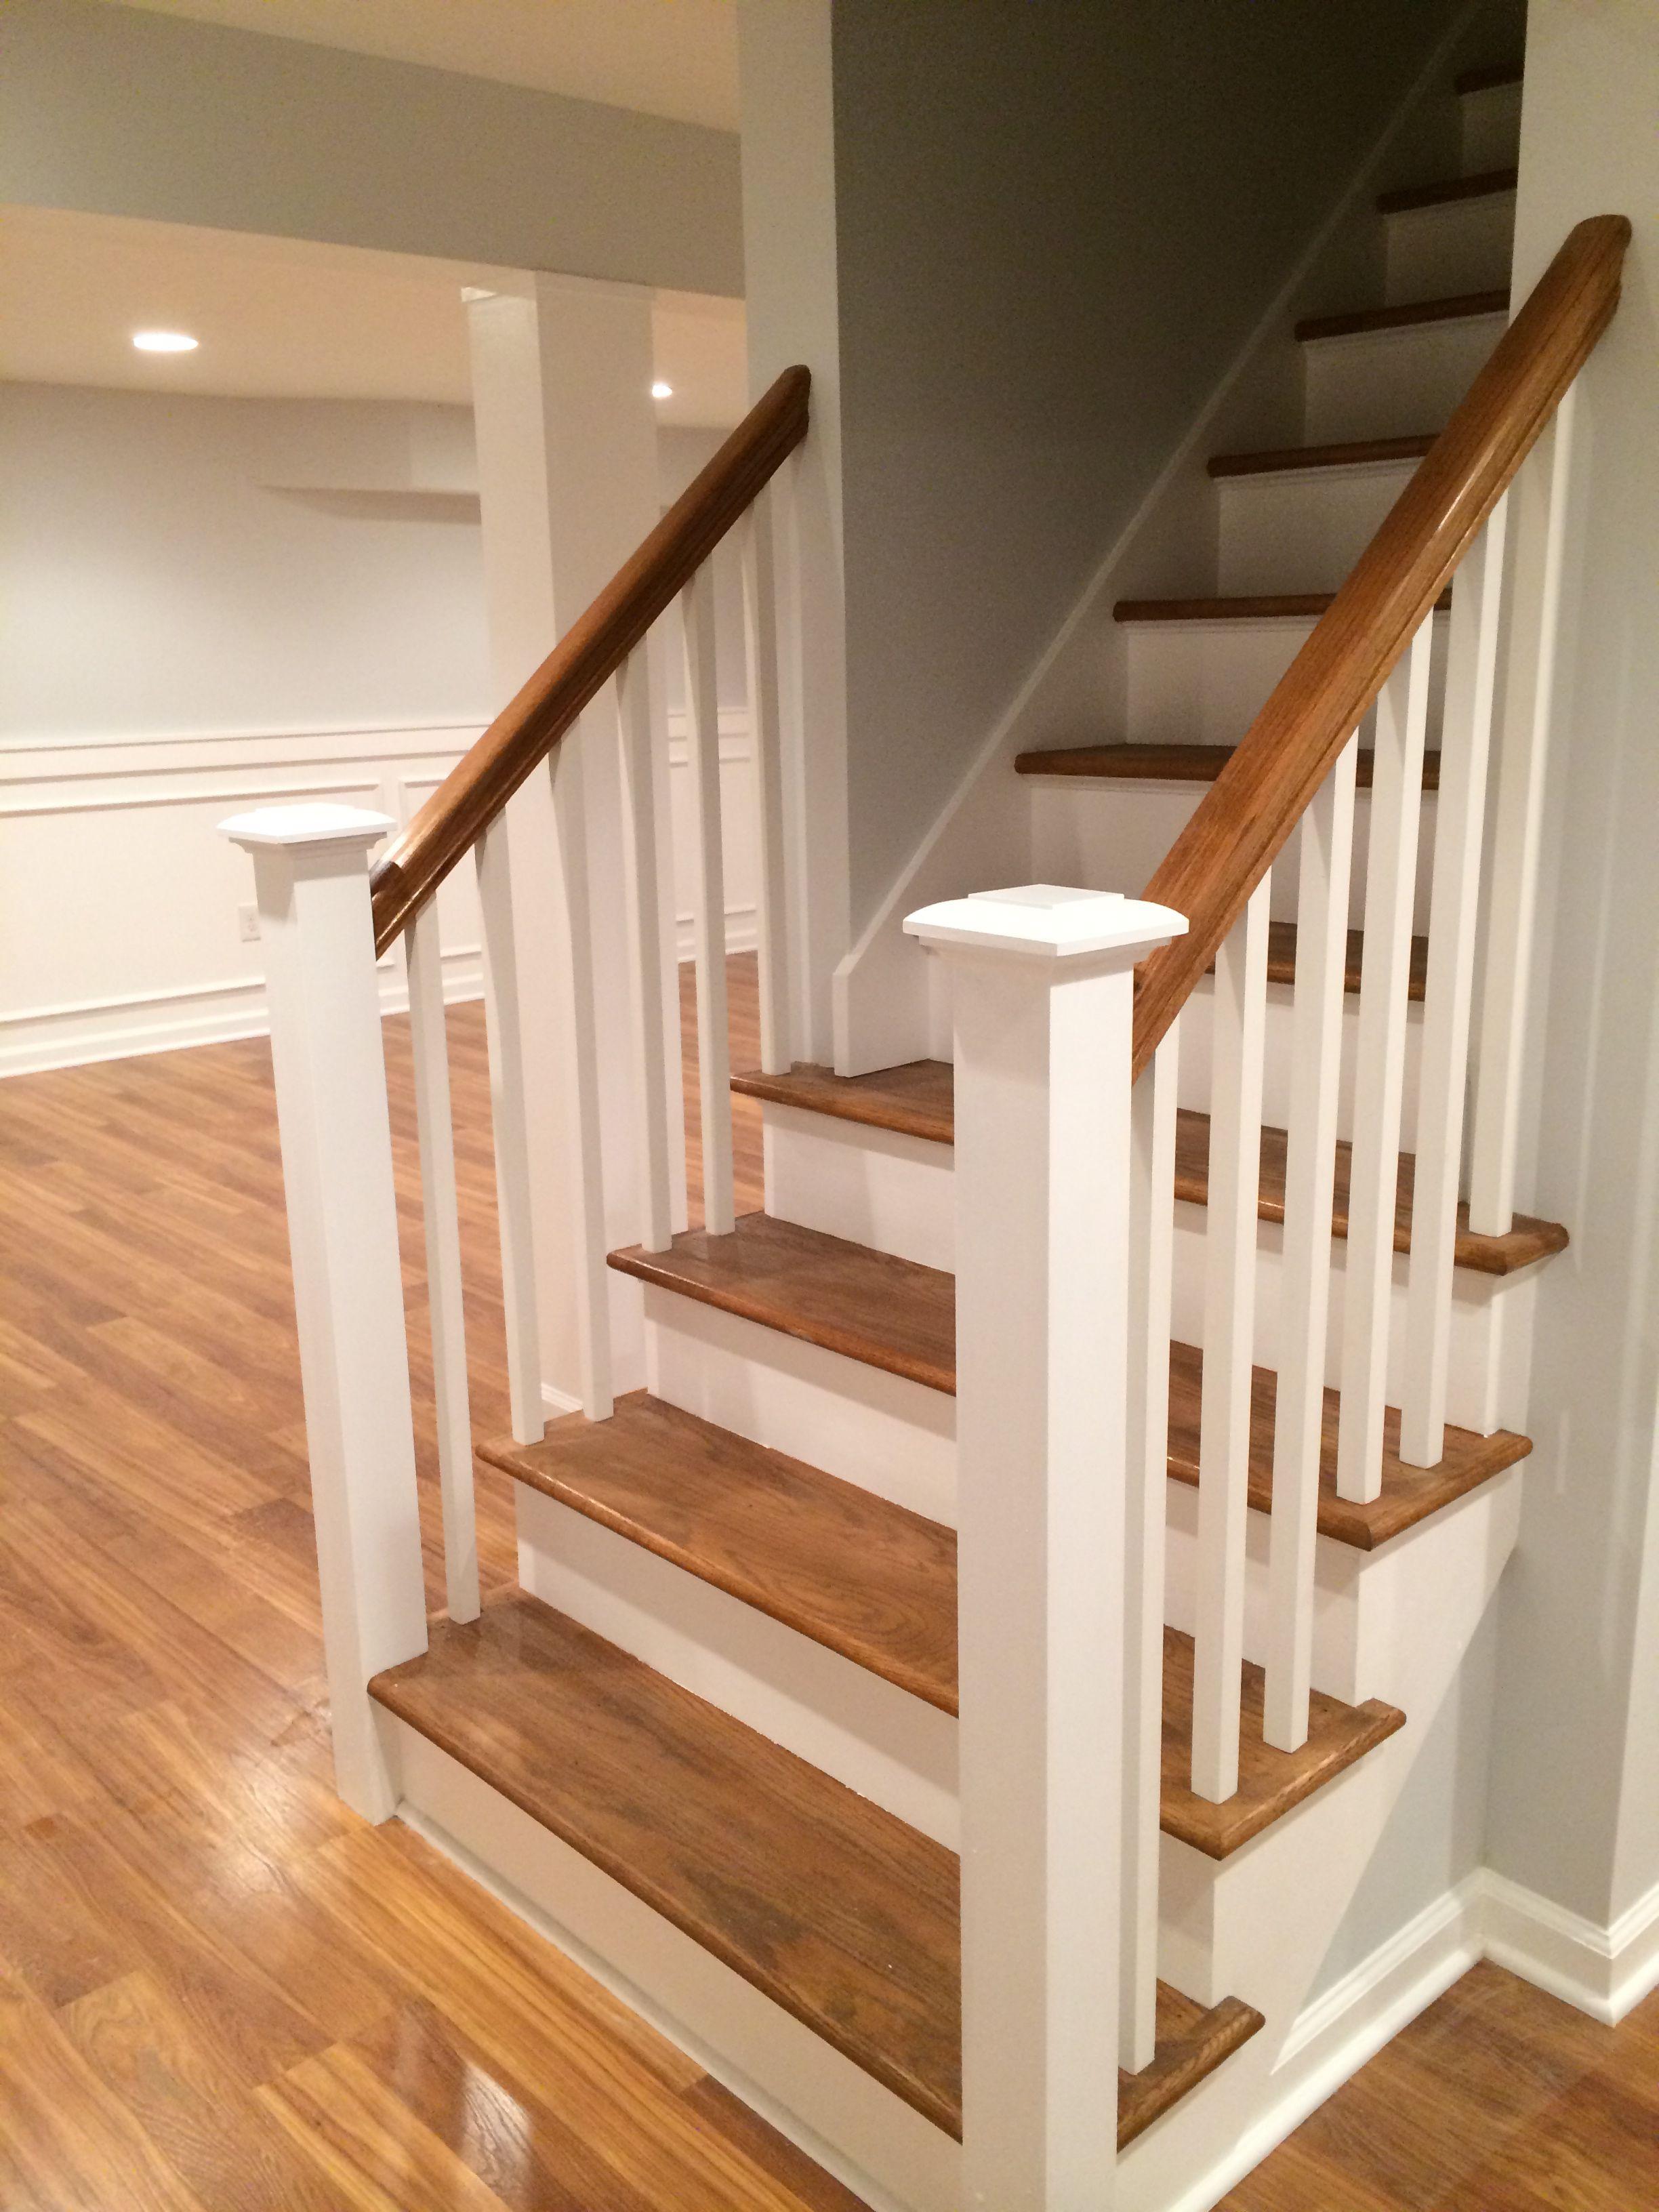 Basement Finishing, Stairs, Basements, Stairways, Ladder, Staircases,  Stiles, Stairway, Basement